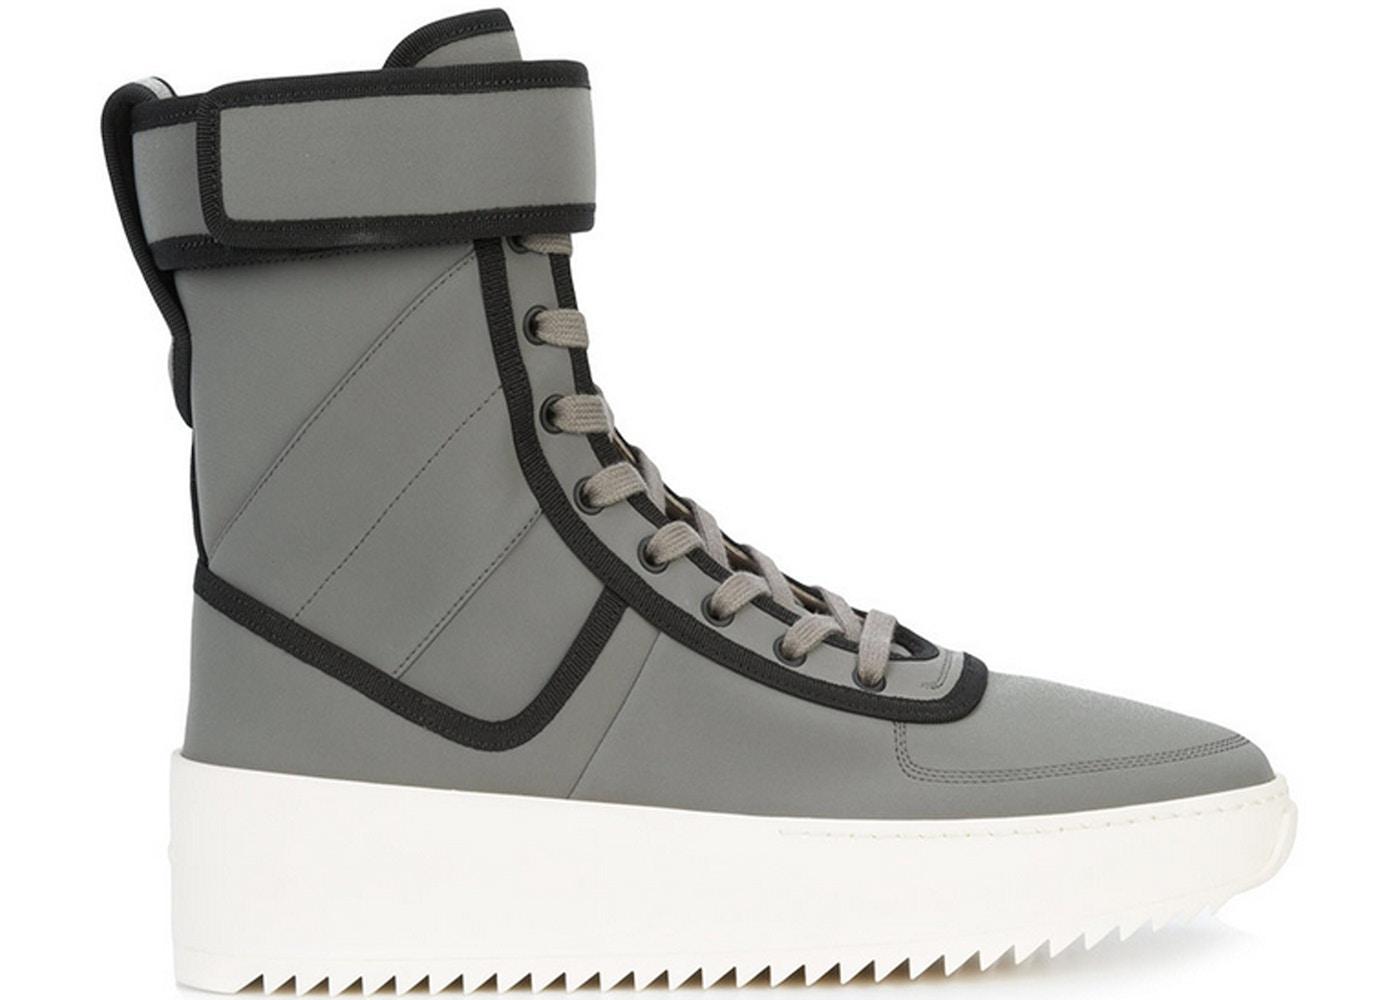 ba72088d888a Fear Of God Military Sneaker Grey Black - FG03S18U-20FNFG9499